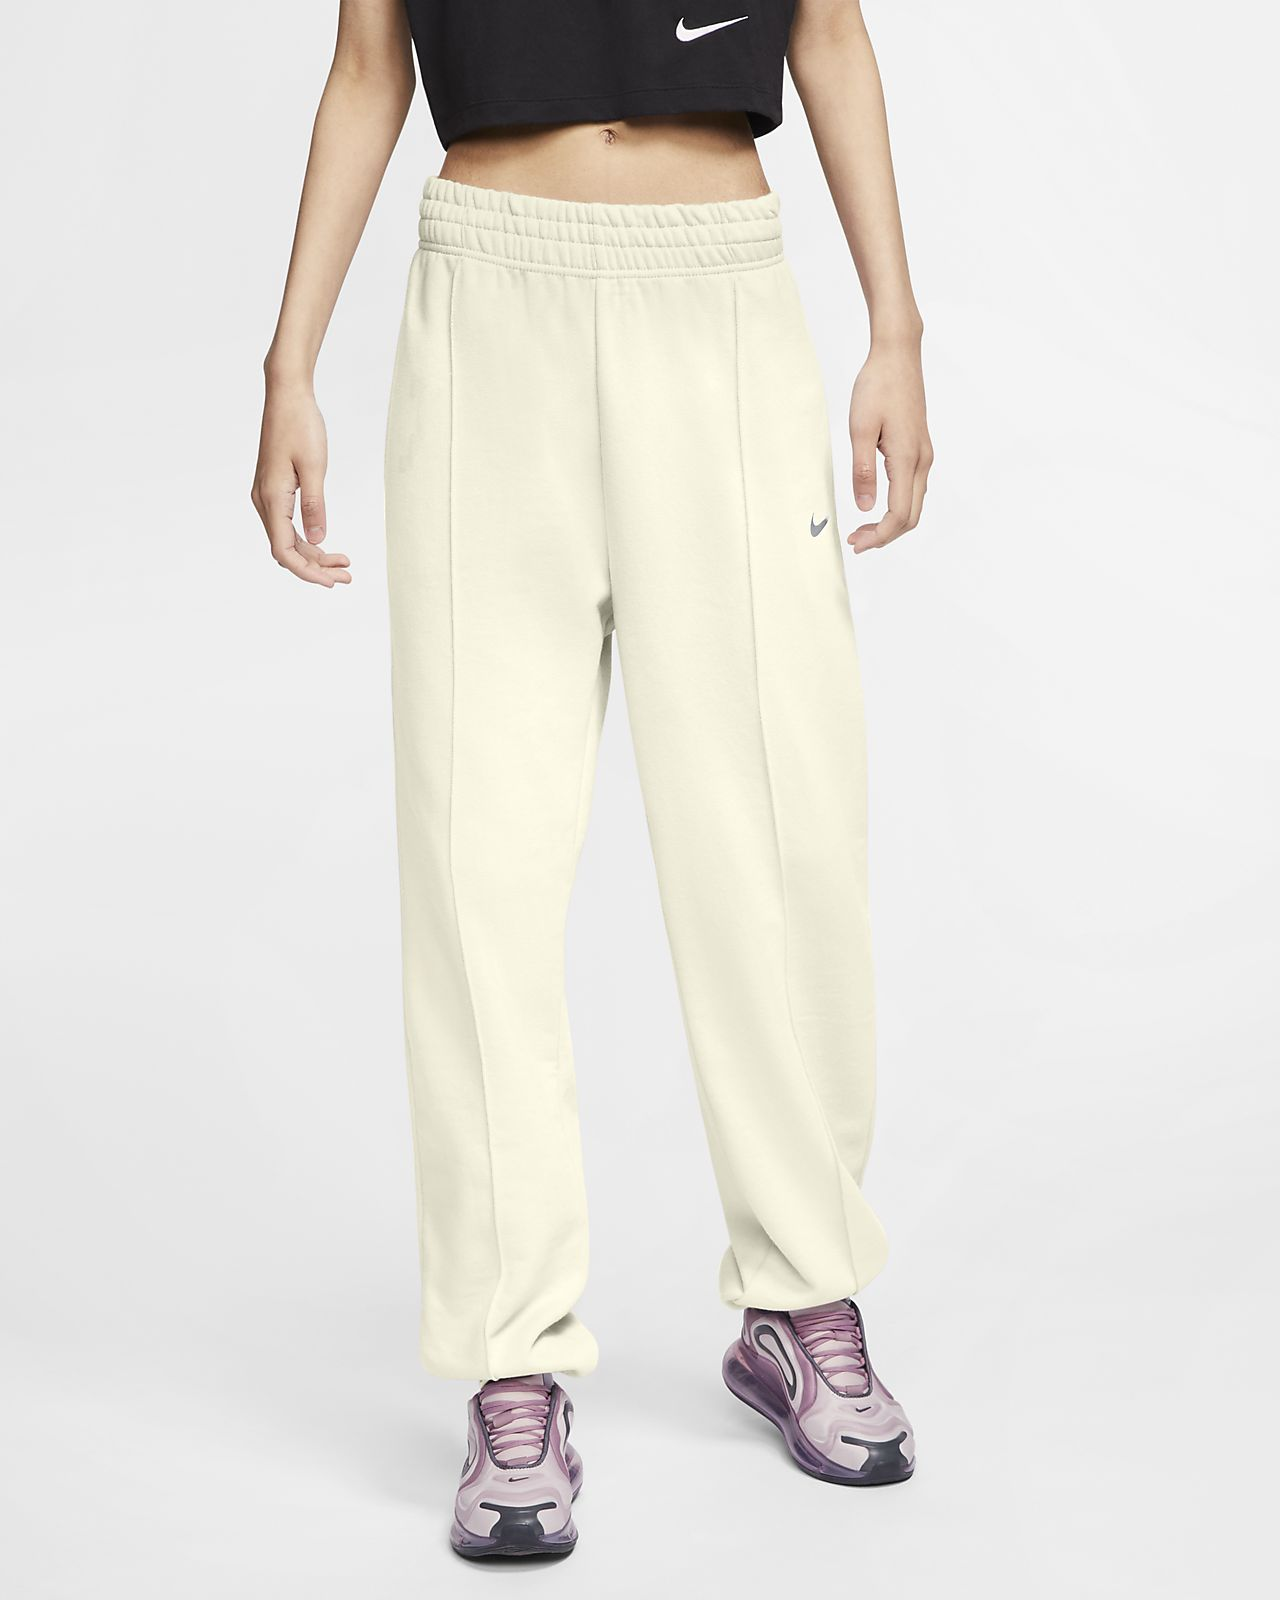 Nike Sportswear Trousers Sail